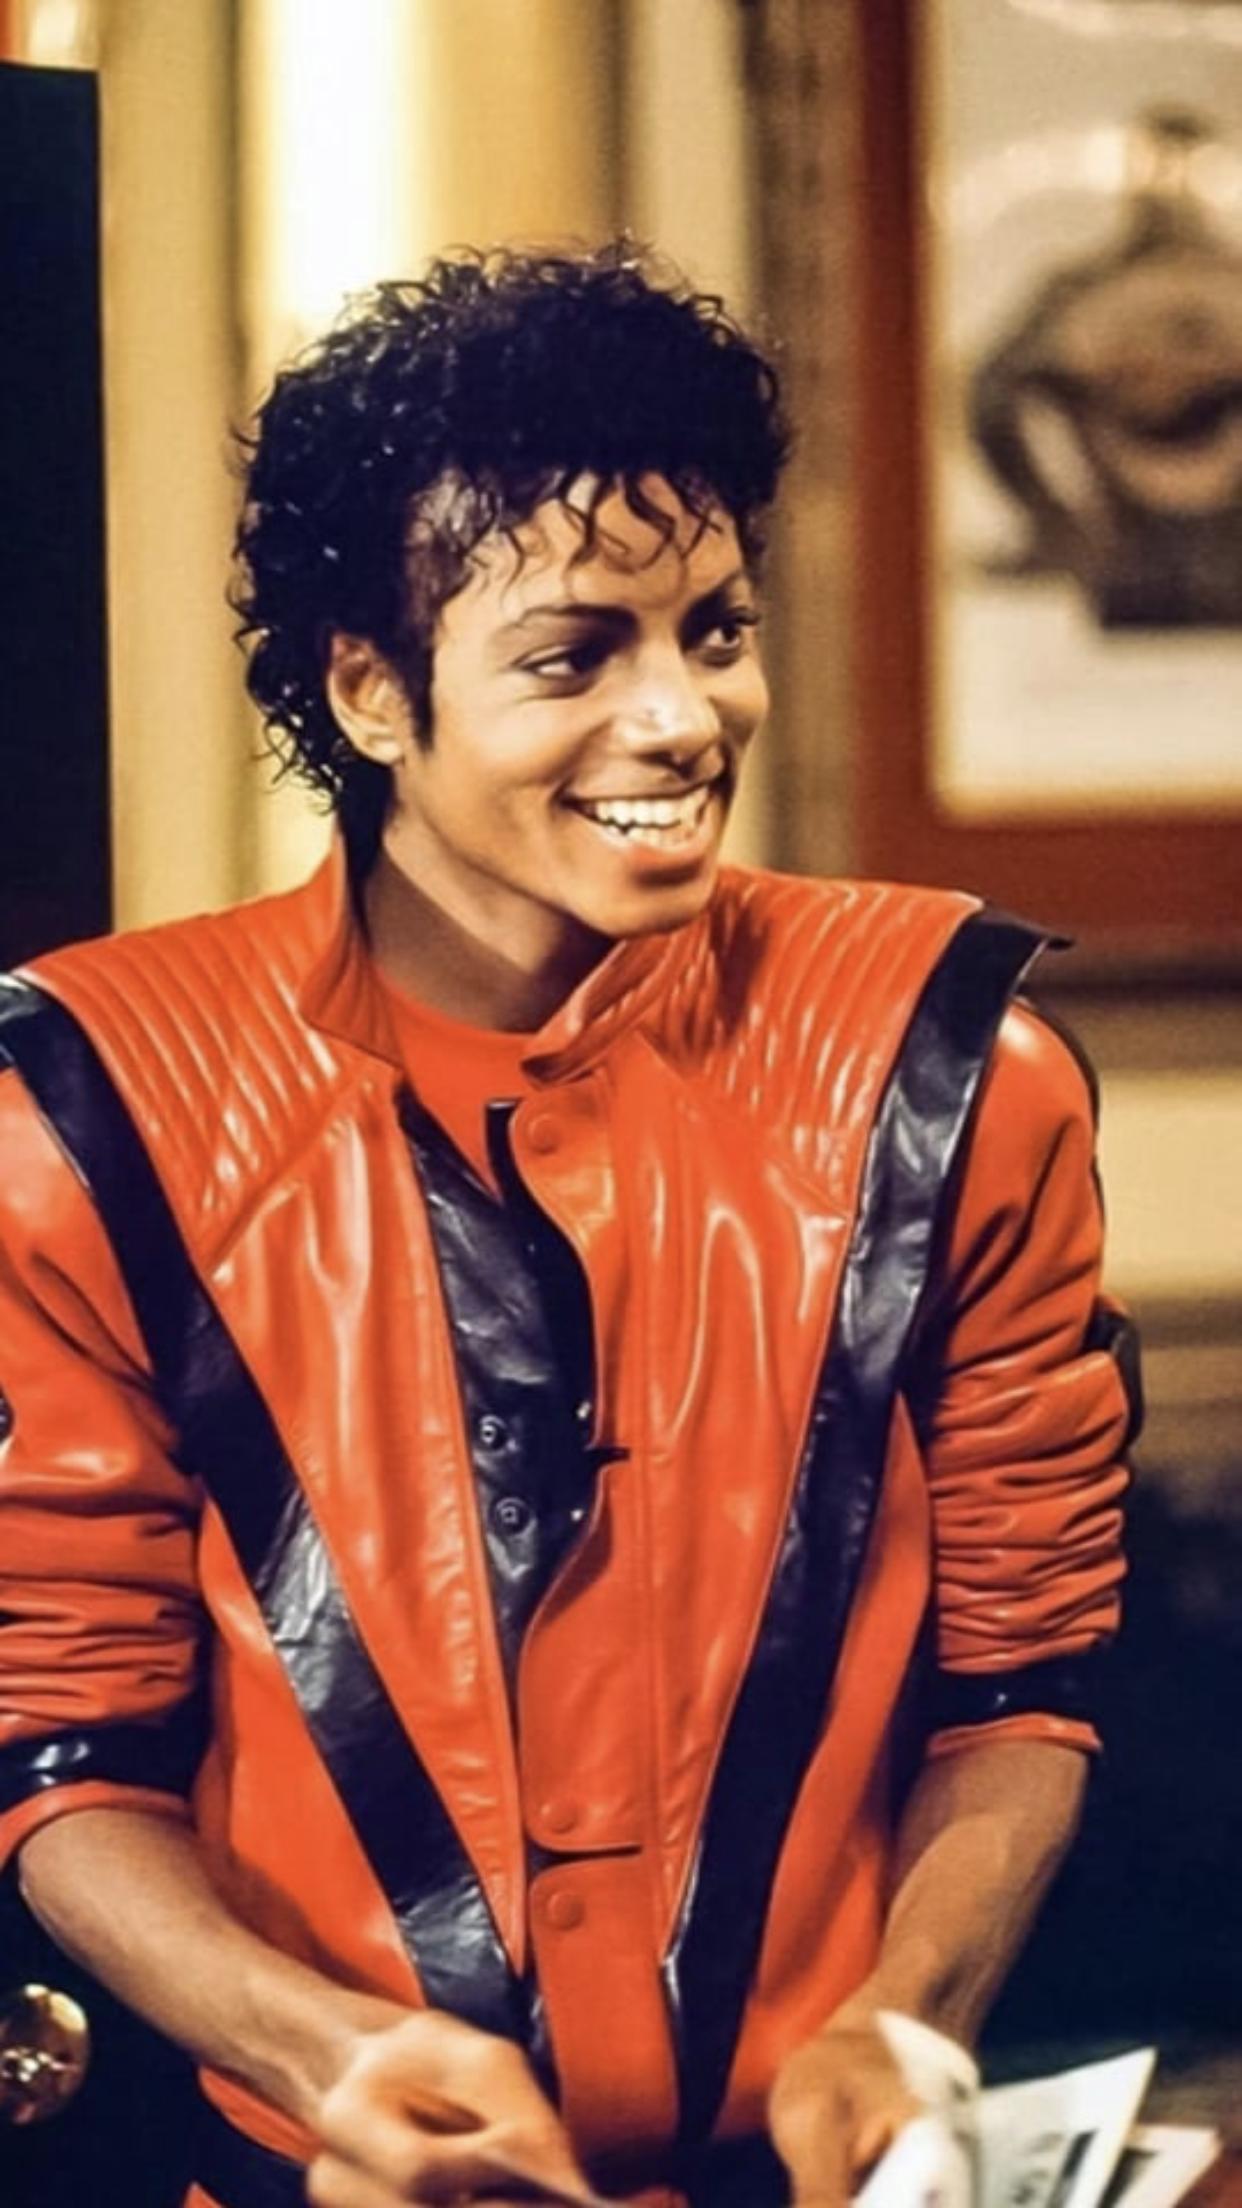 Pin By Fav On Michael Jackson Michael Jackson Thriller Michael Jackson Smile Michael Jackson Pics